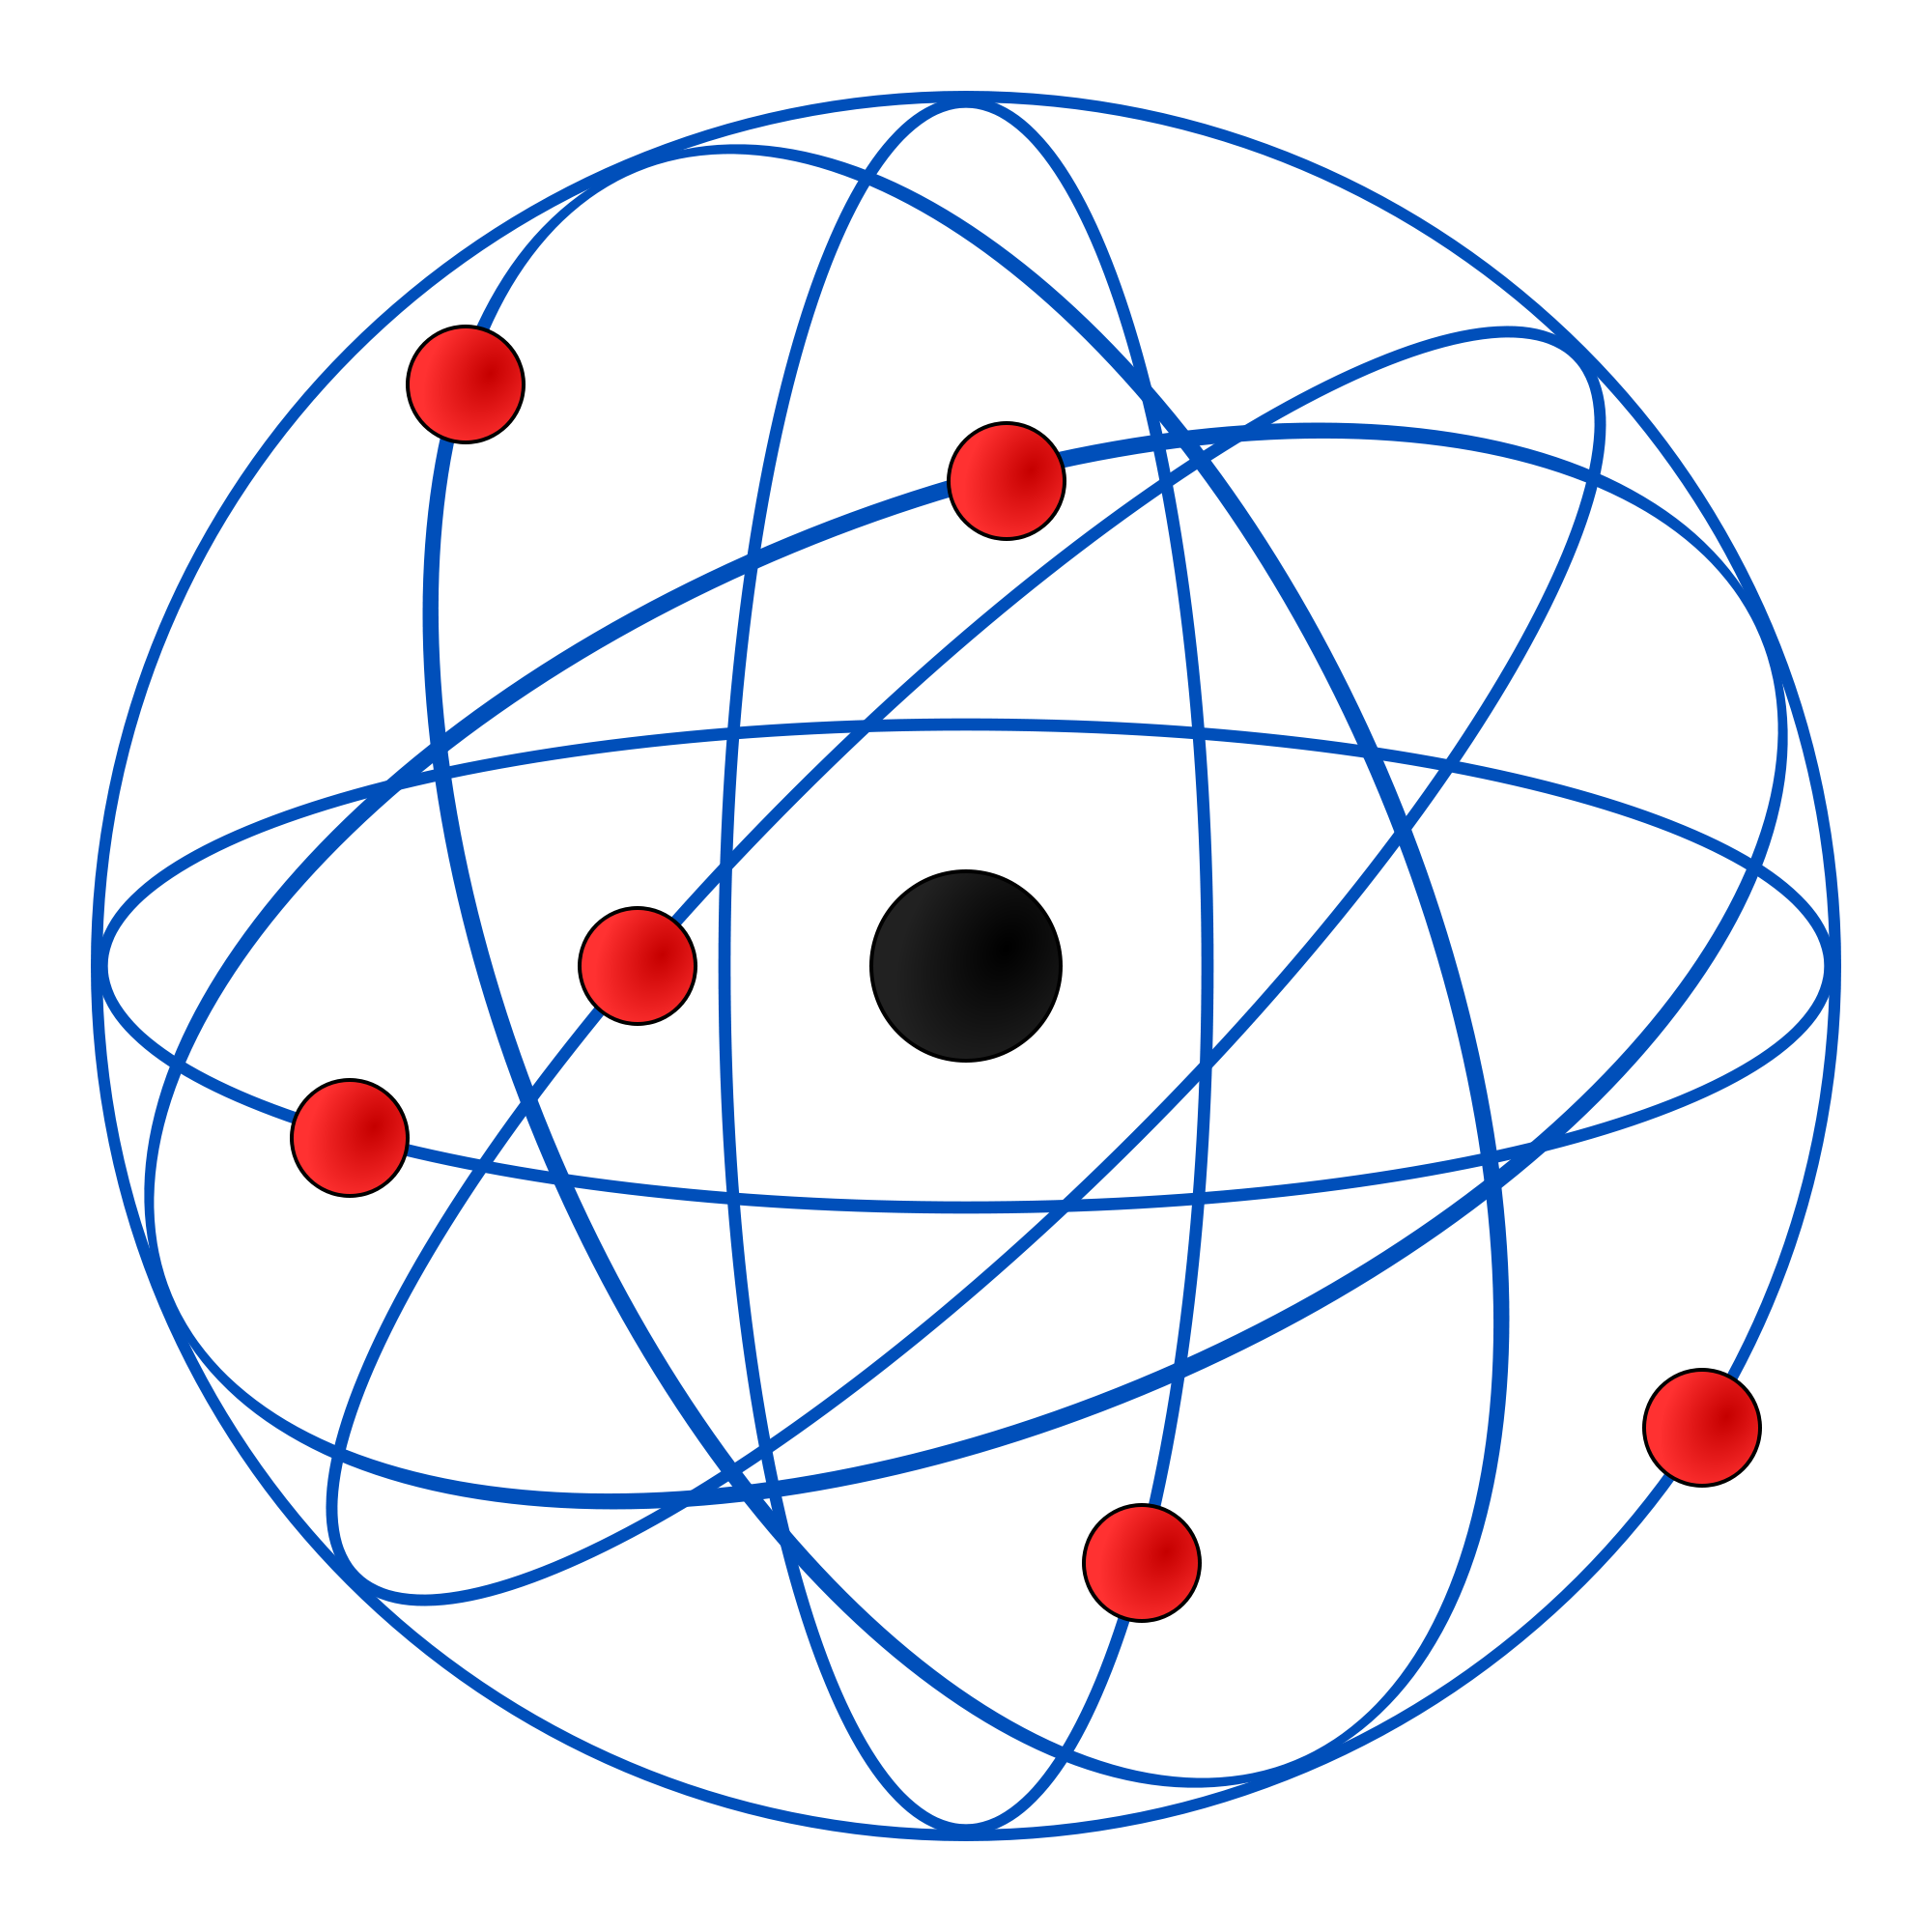 Atomic svg #10, Download drawings